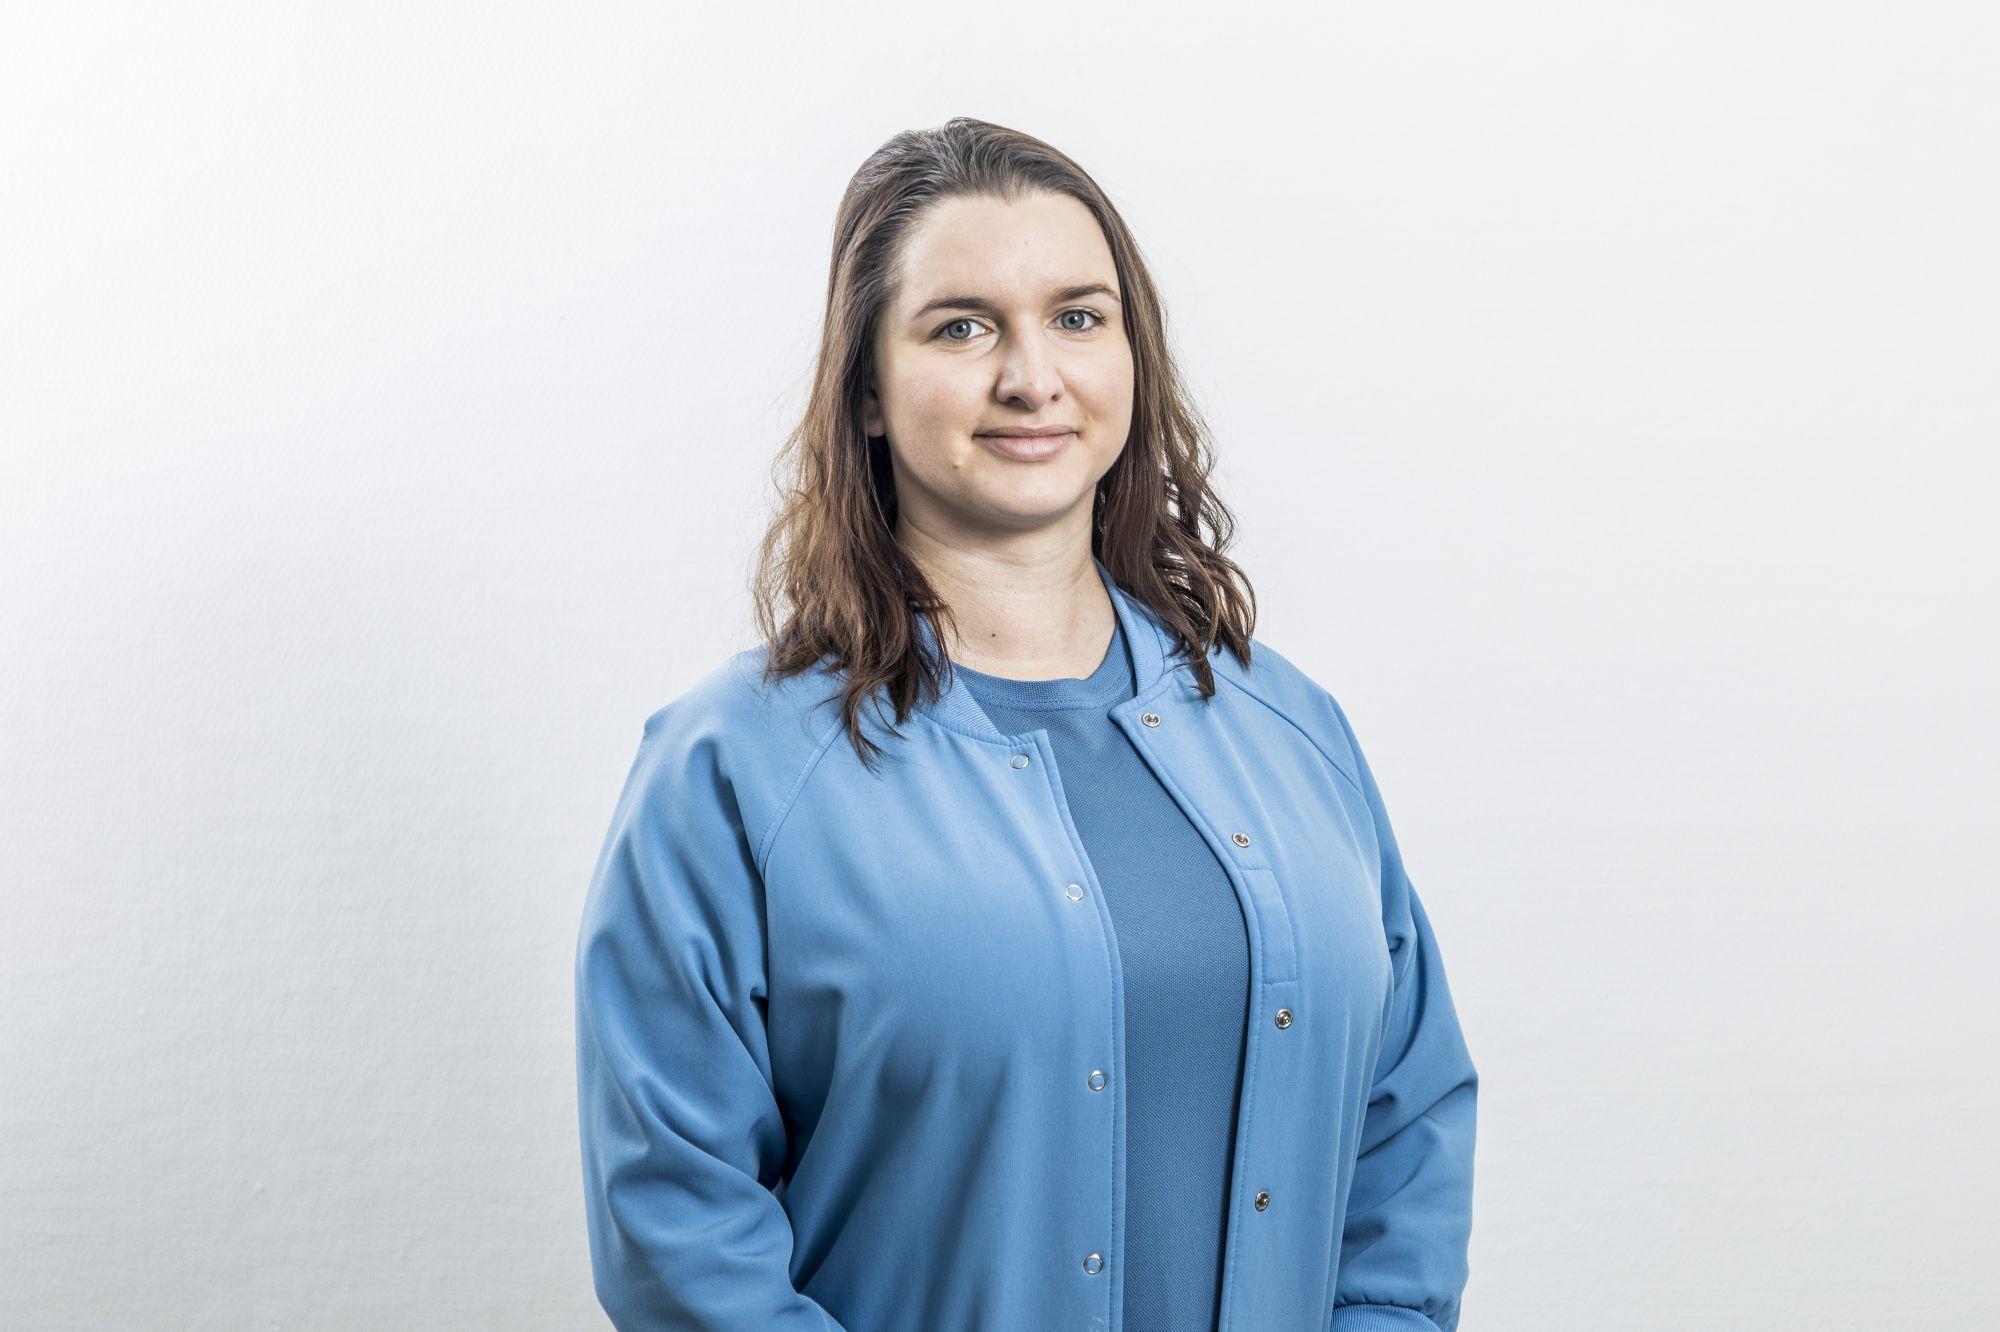 Hana Vrzakova